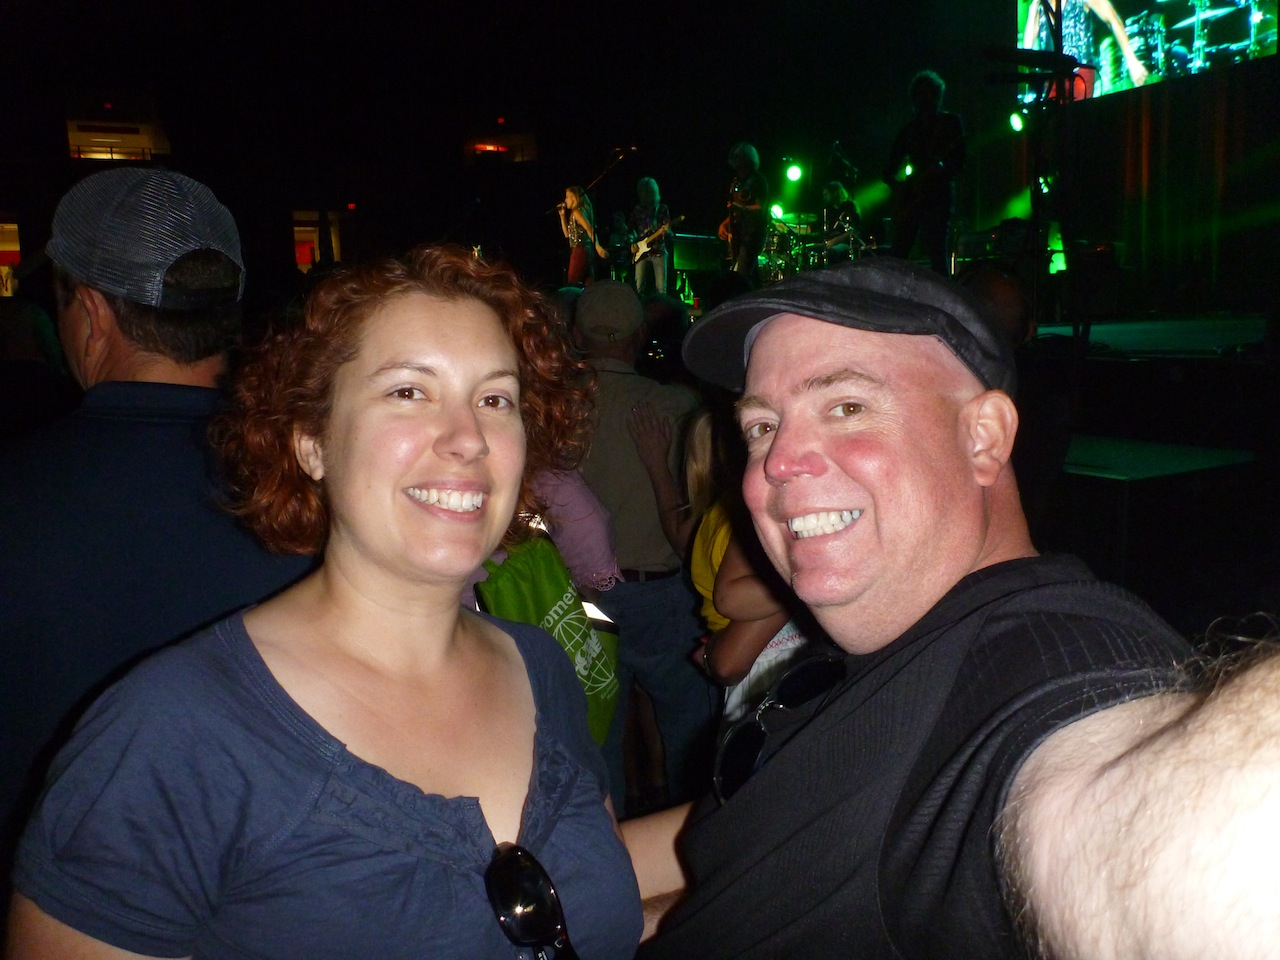 David And Brenda At The Sheryl Crow Concert